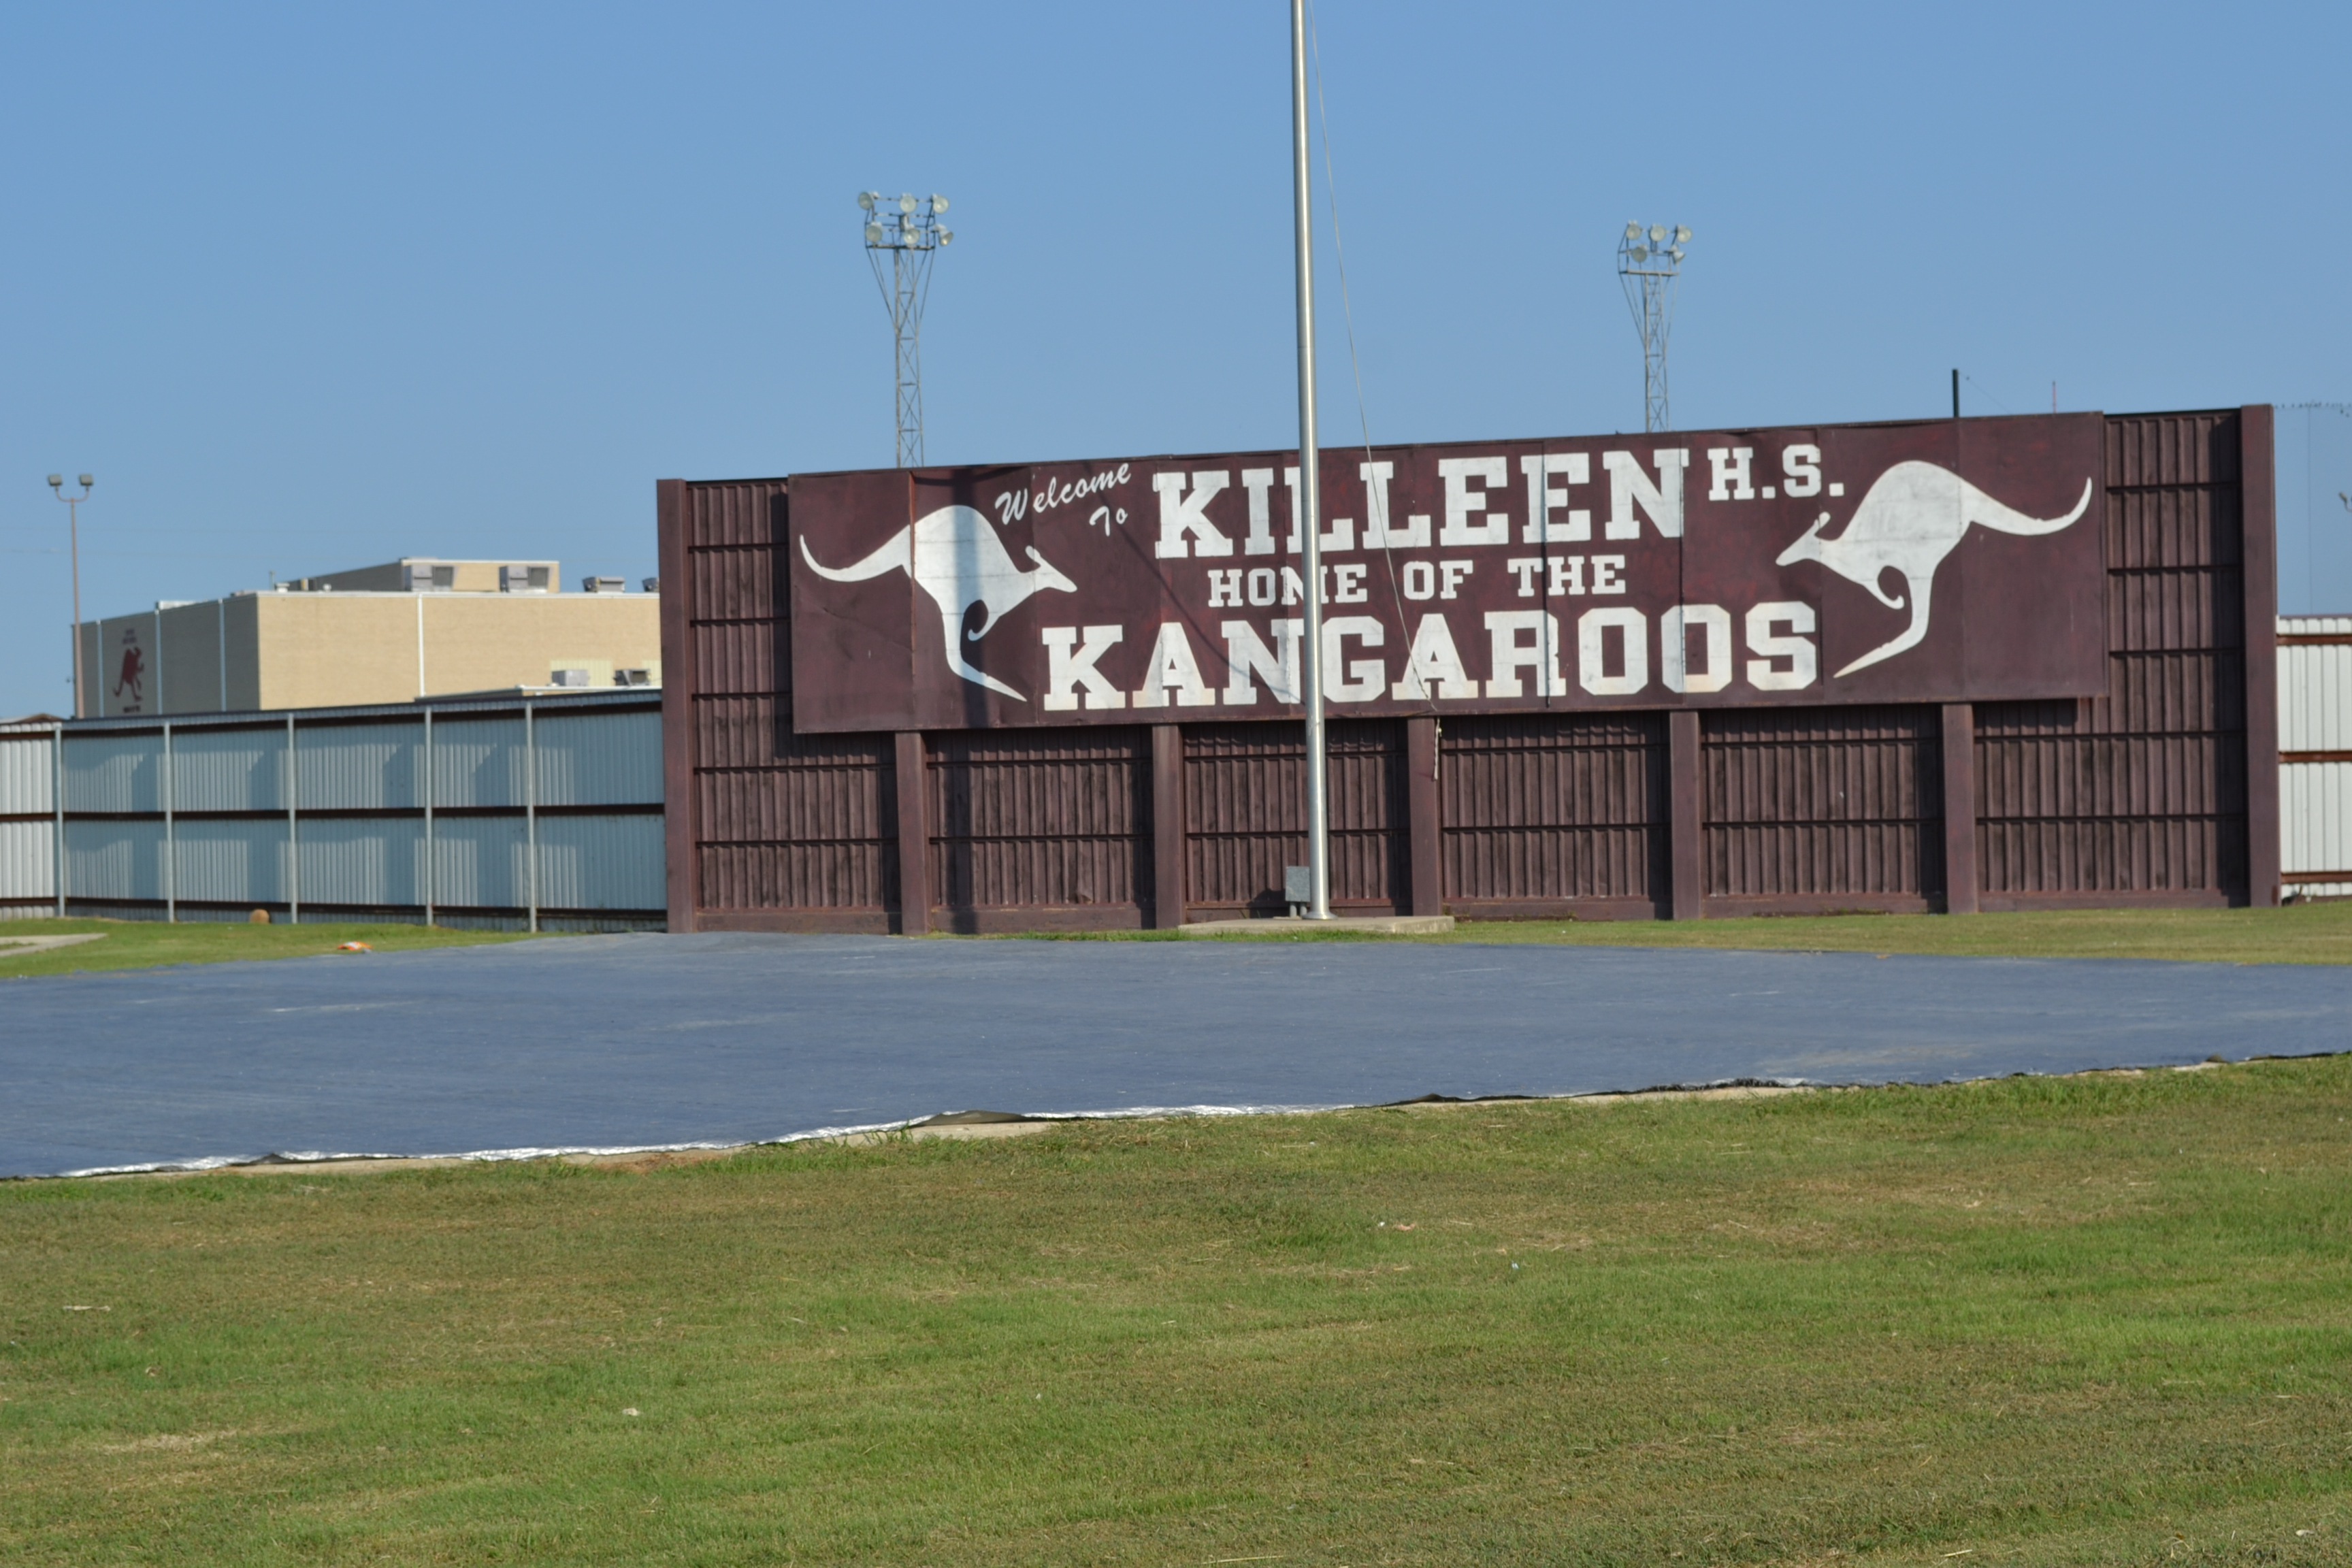 File:Killeen High School 24 jpg - Wikimedia Commons